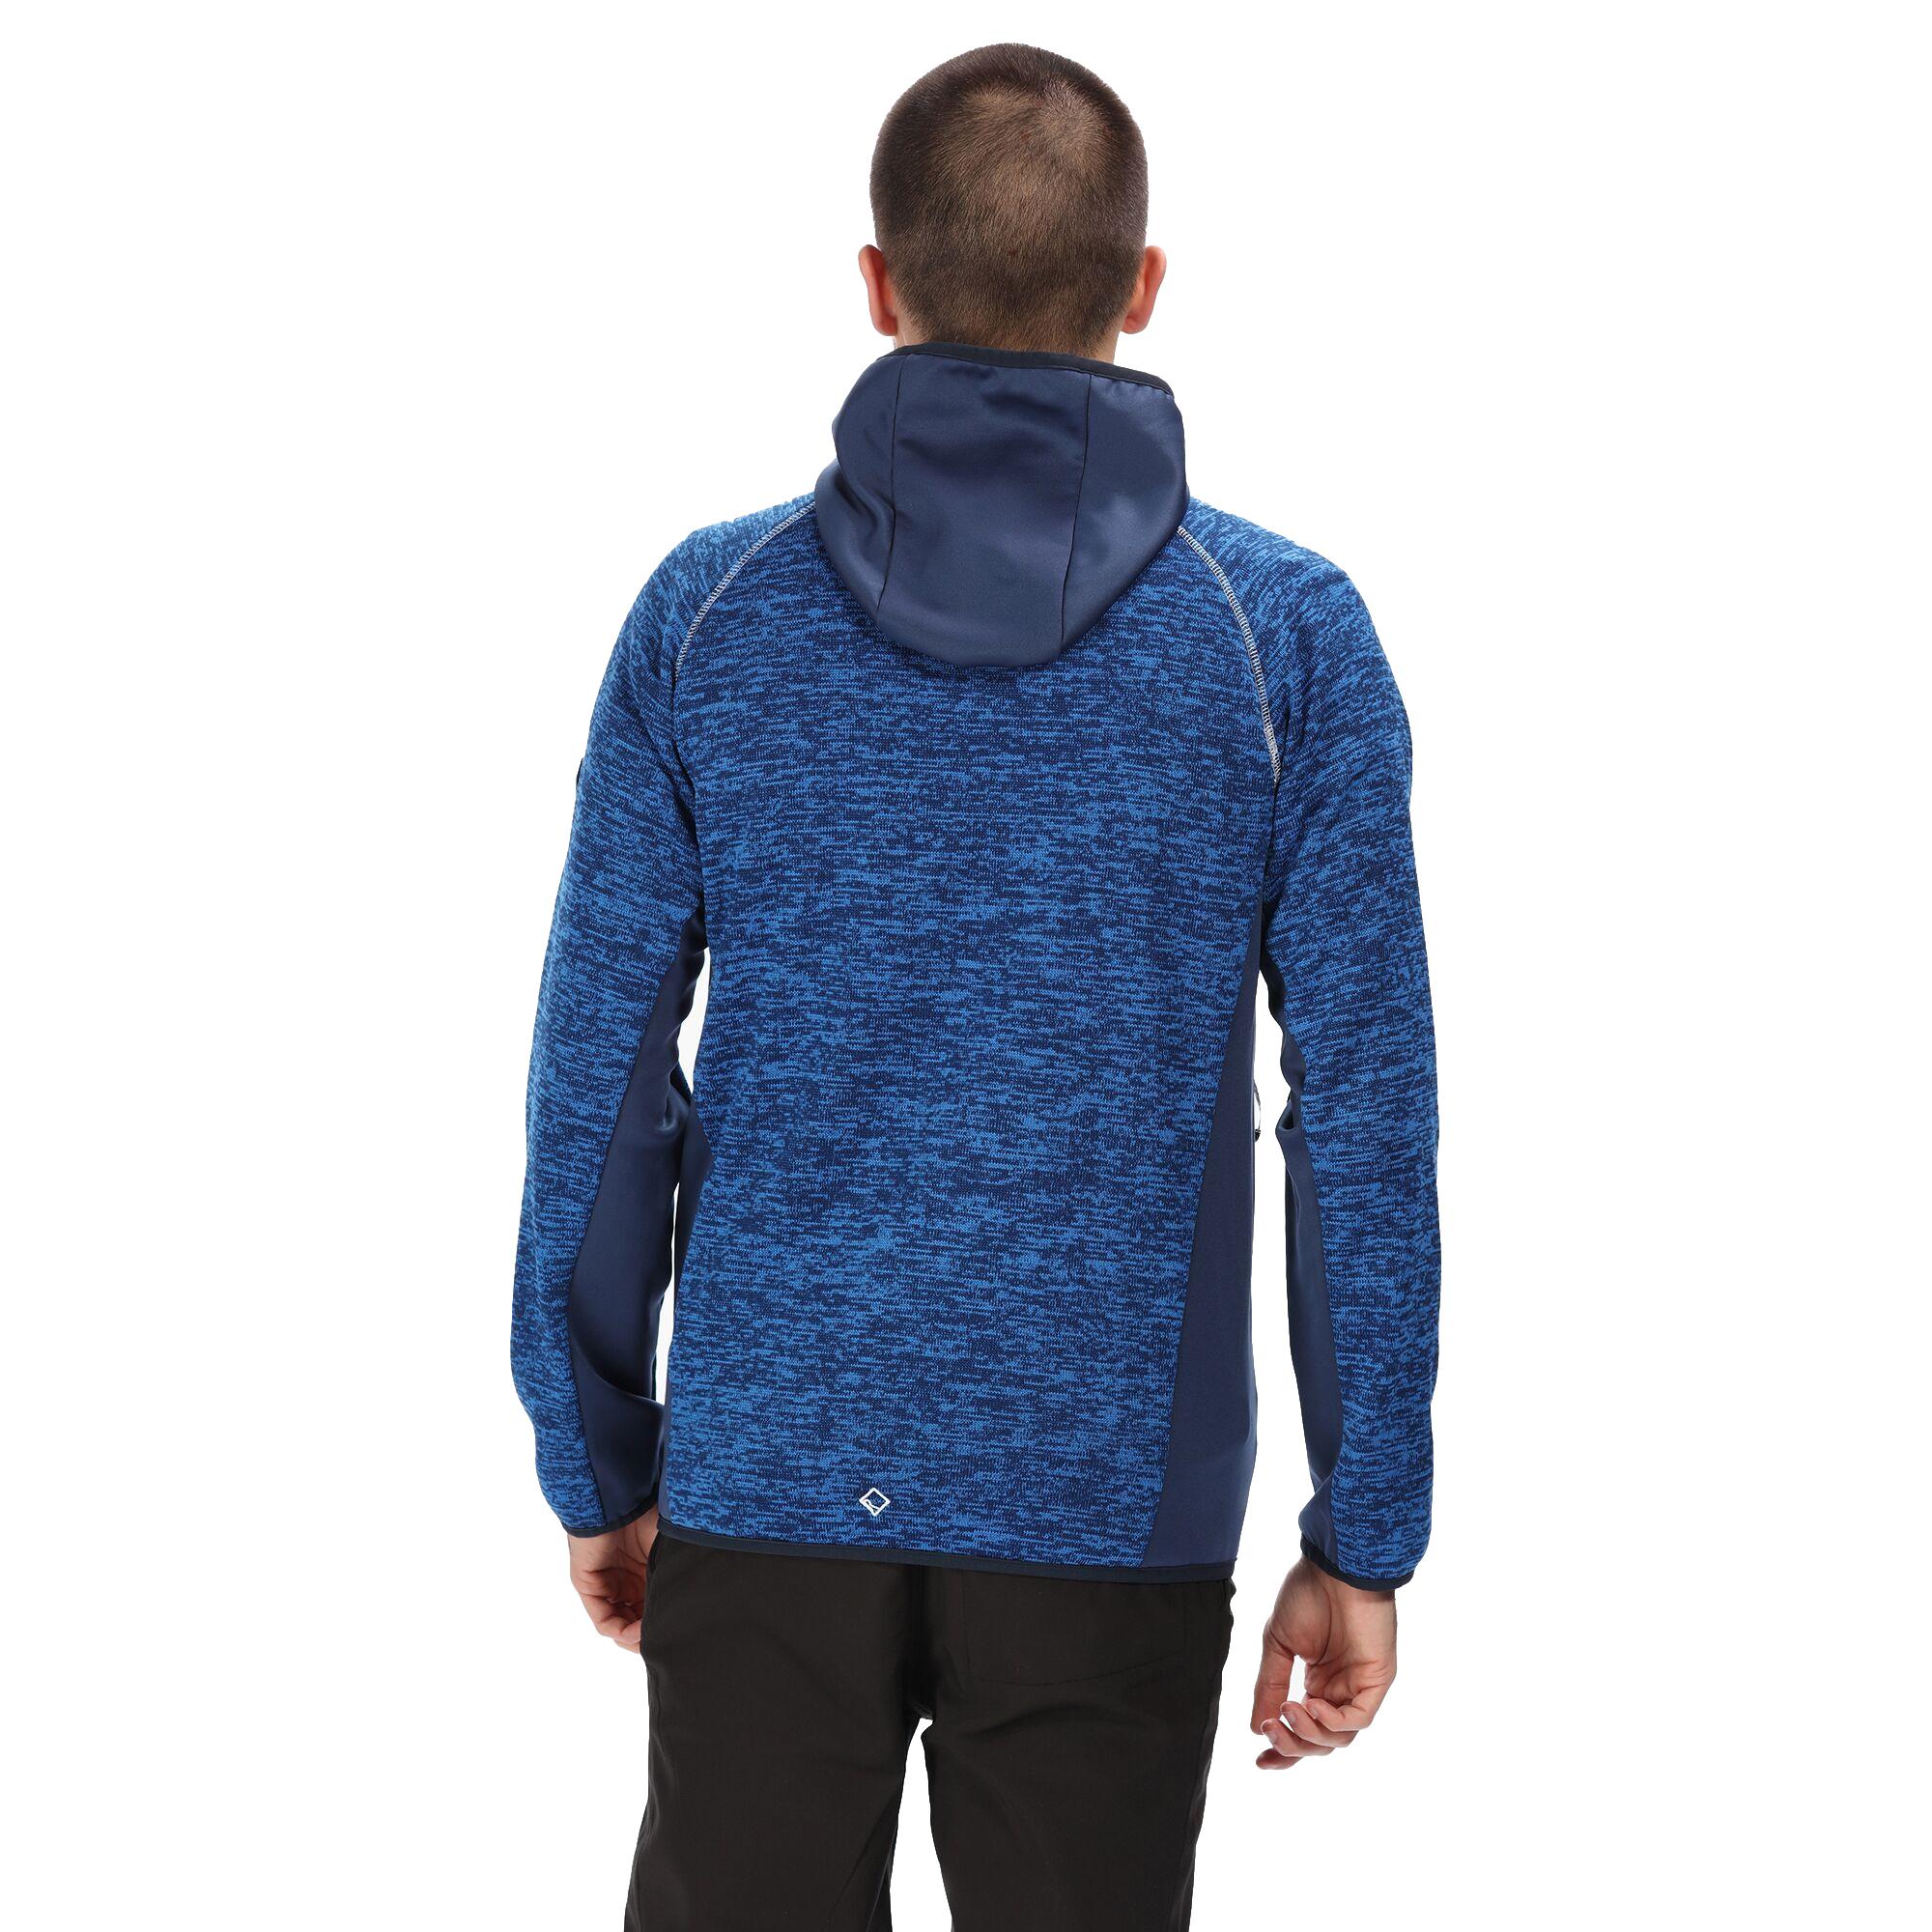 Regatta-Mens-Fleece-Jacket-amp-Hoodie-Massive-Clearance-RRP-60 thumbnail 10